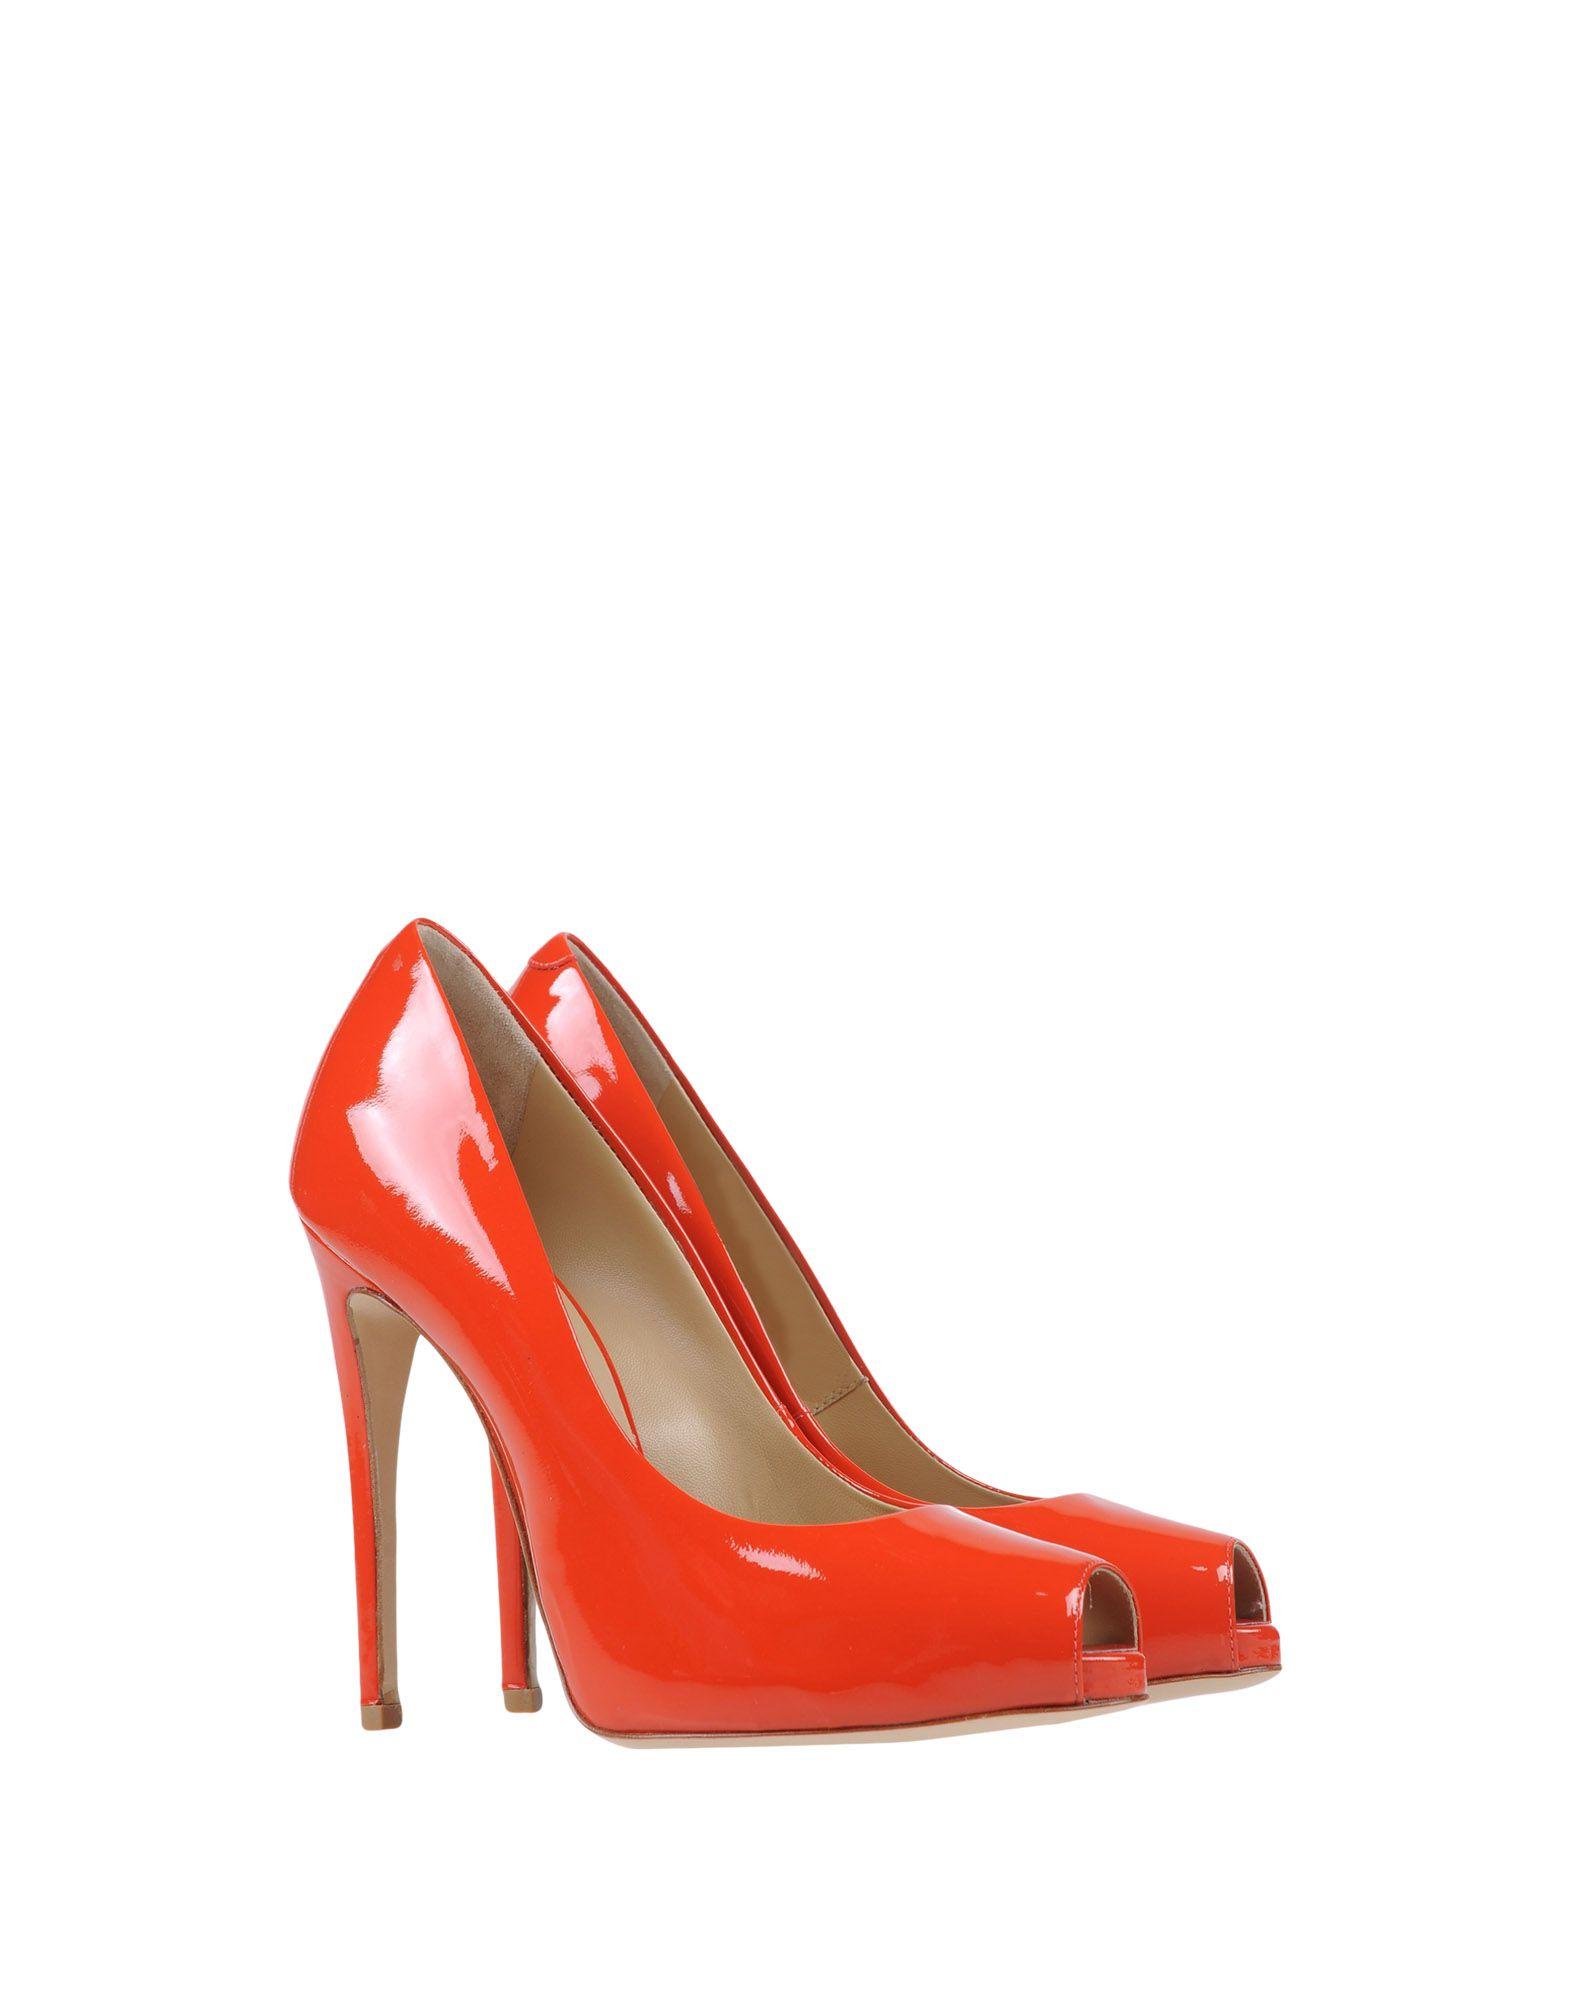 Escarpins Giuseppe Zanotti Design Femme - Escarpins Giuseppe Zanotti Design sur